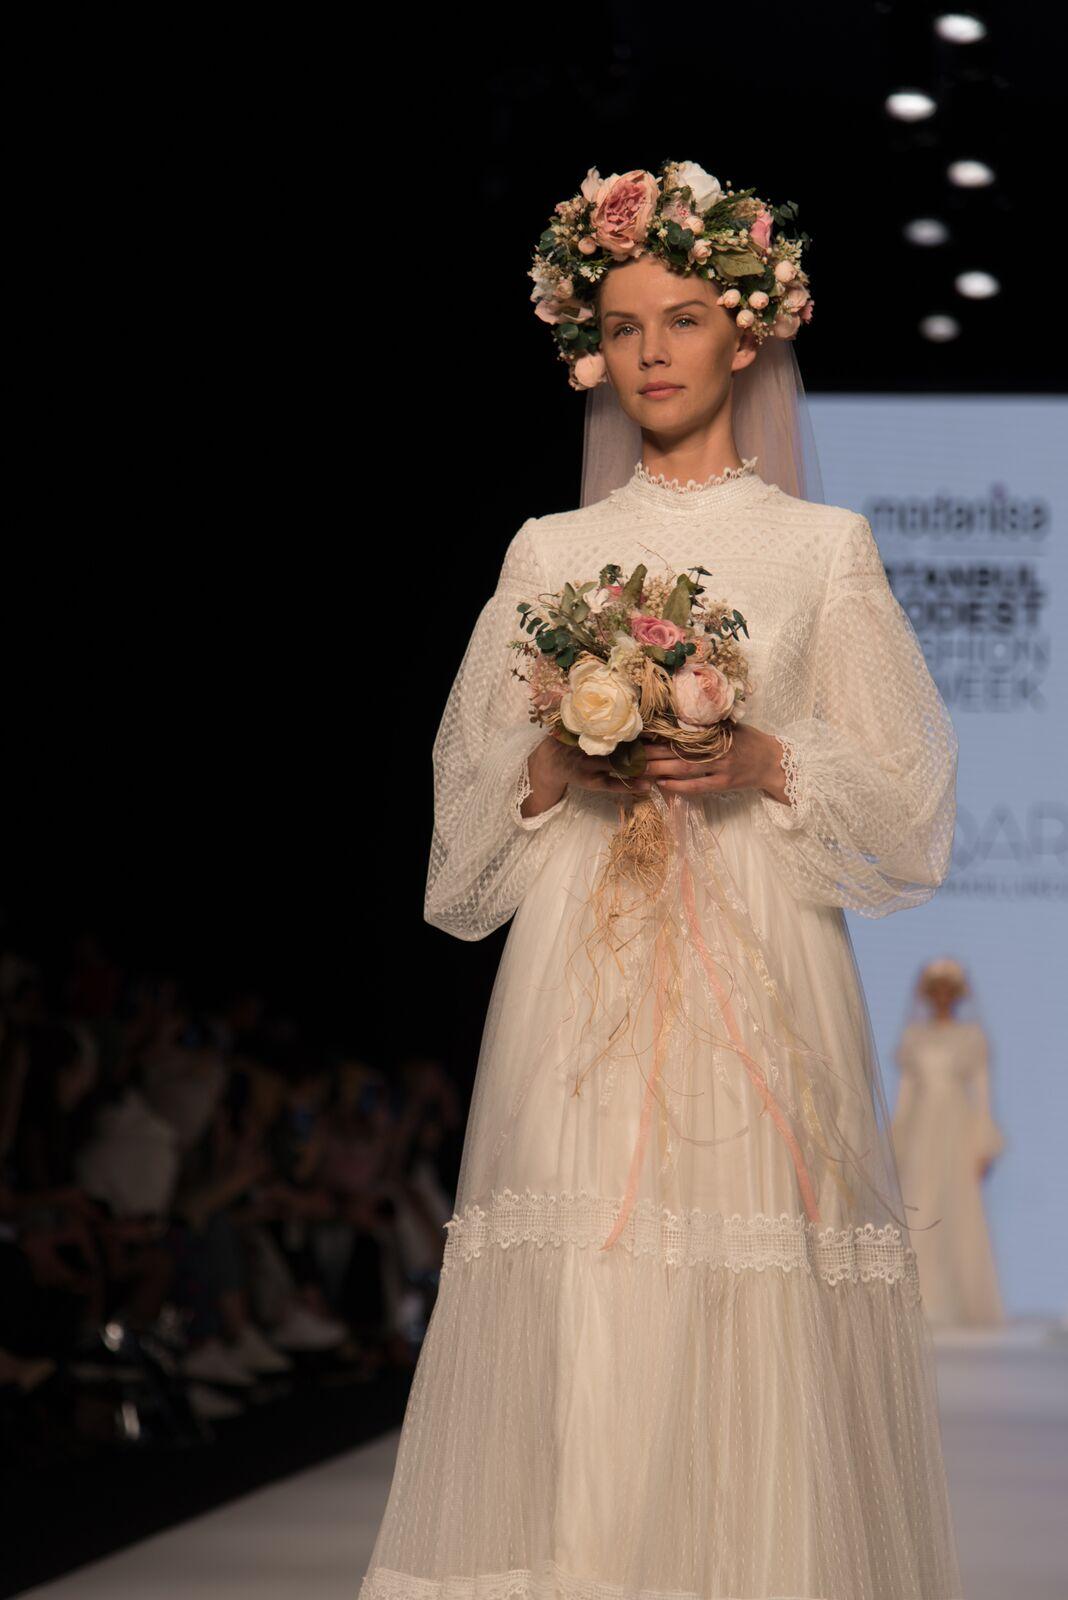 Jaqar roo at istanbul modest fashion week 2019 day 2